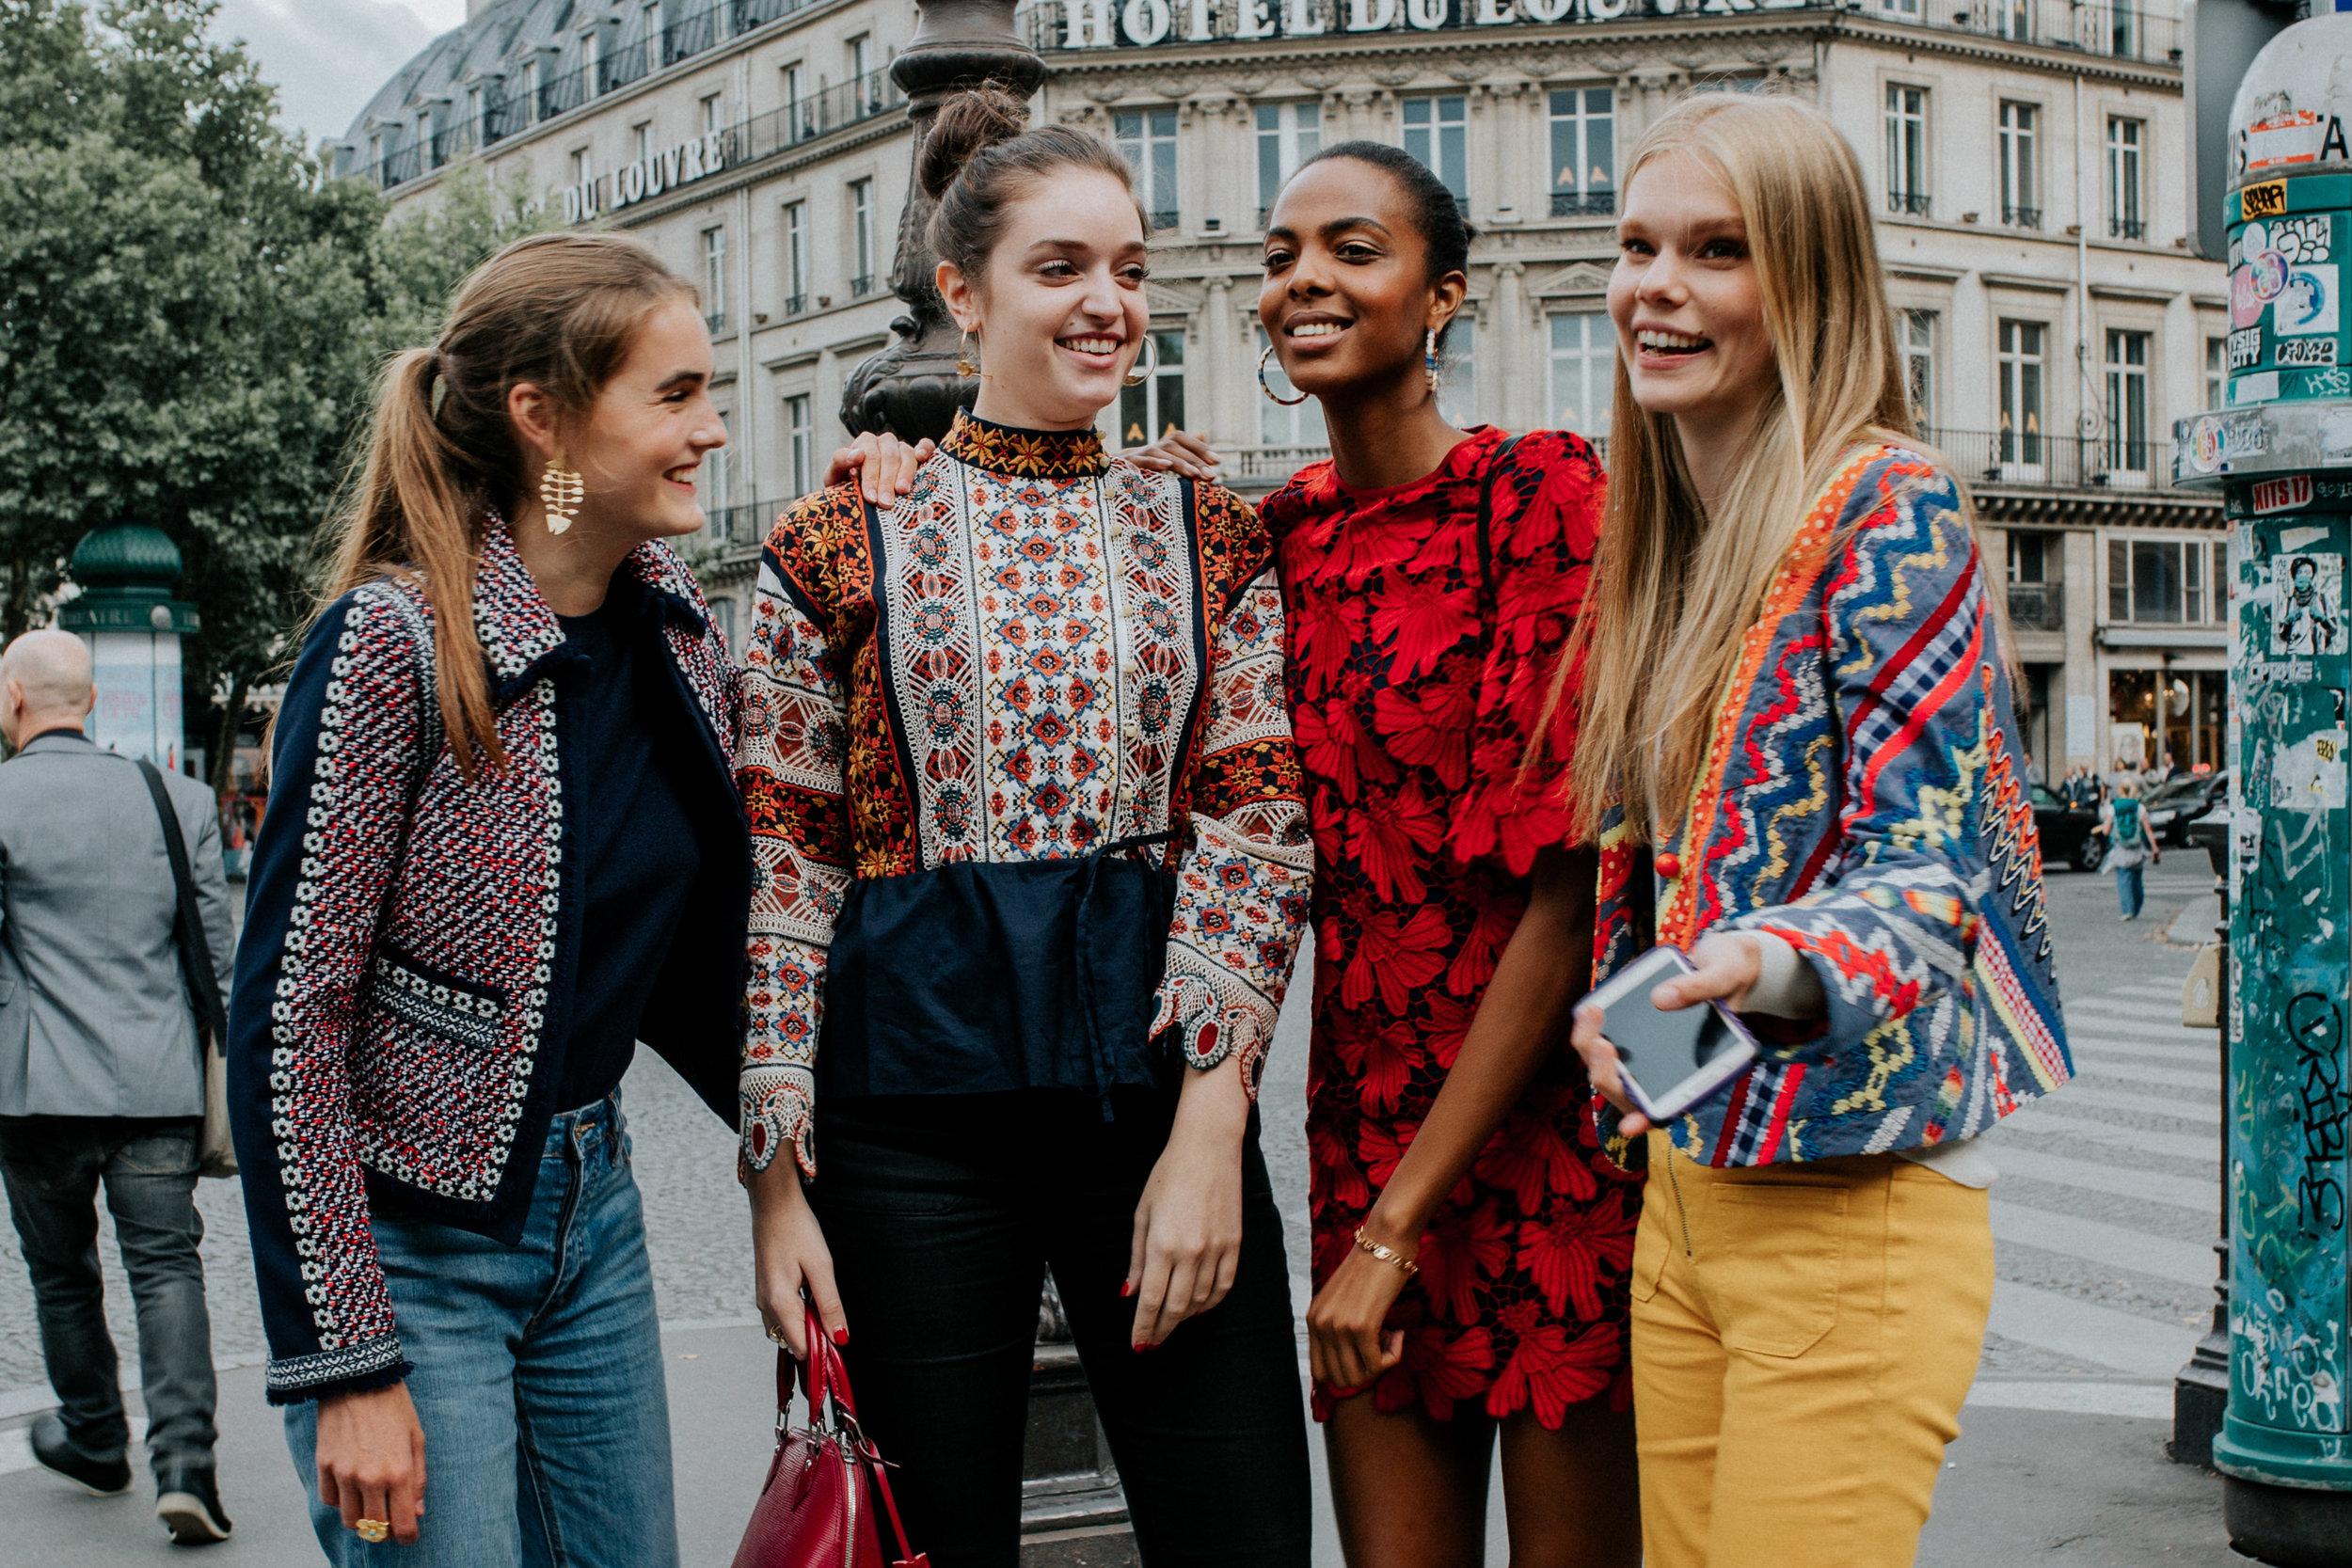 - Final Group Looks: Atasia's Dress, Lisa's Jacket& Jeans,Vita's Jacket & Pants, Doriana's Top,